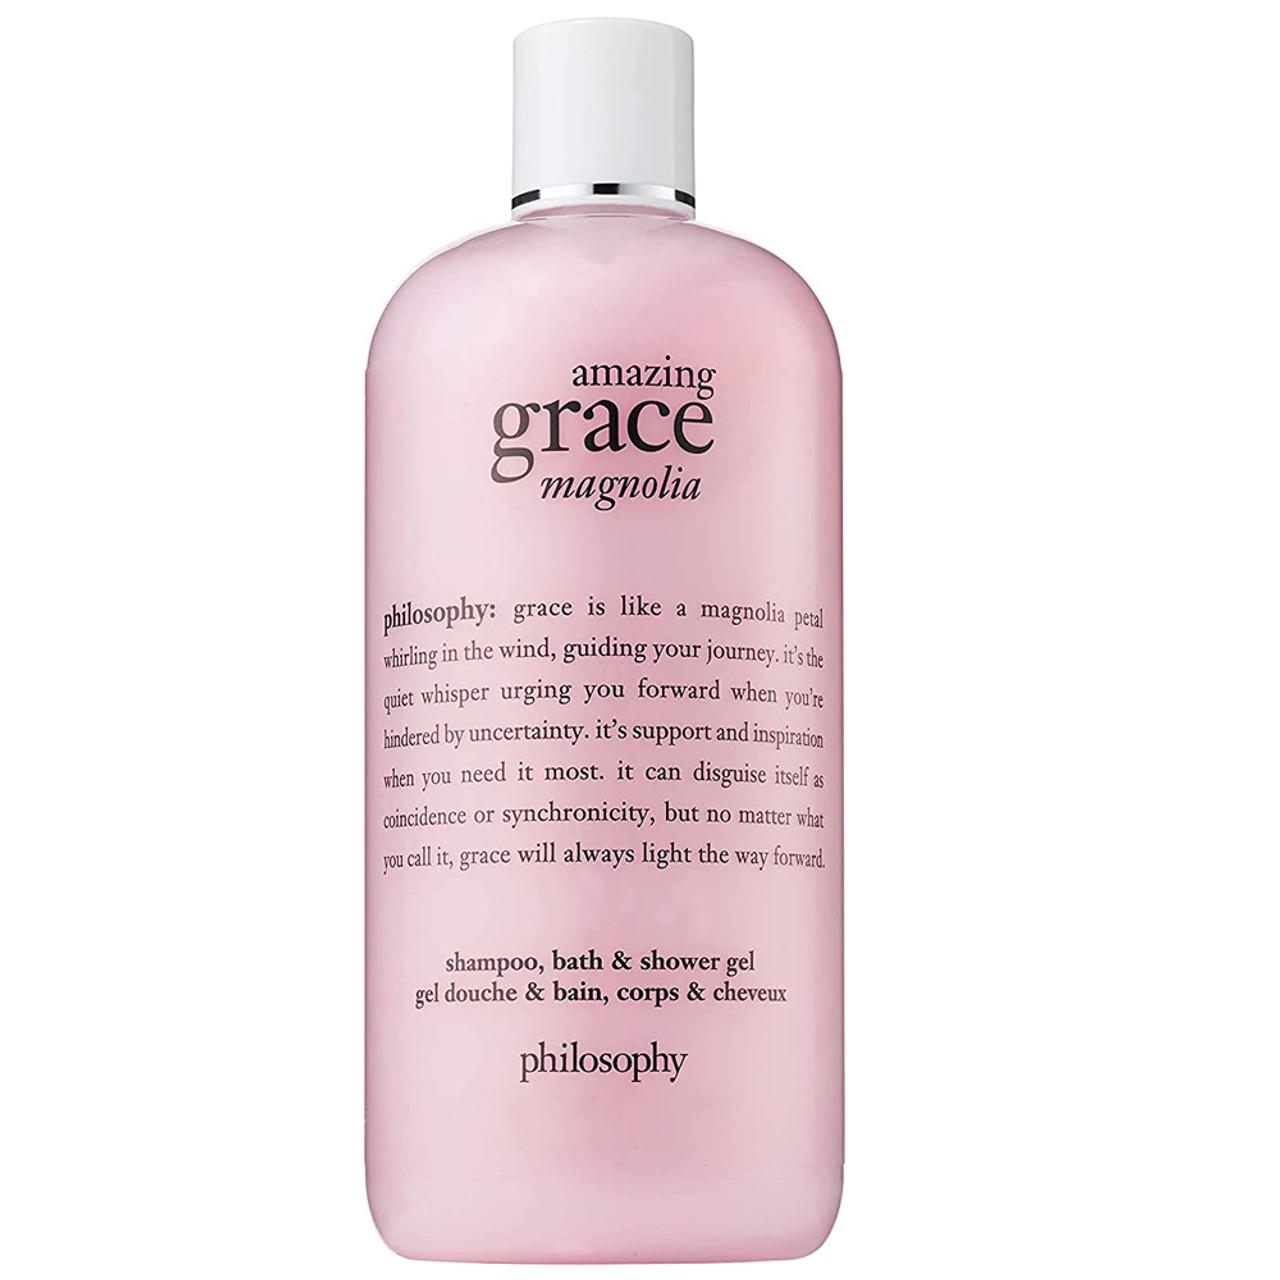 philosophy Amazing Grace Magnolia Shower Gel